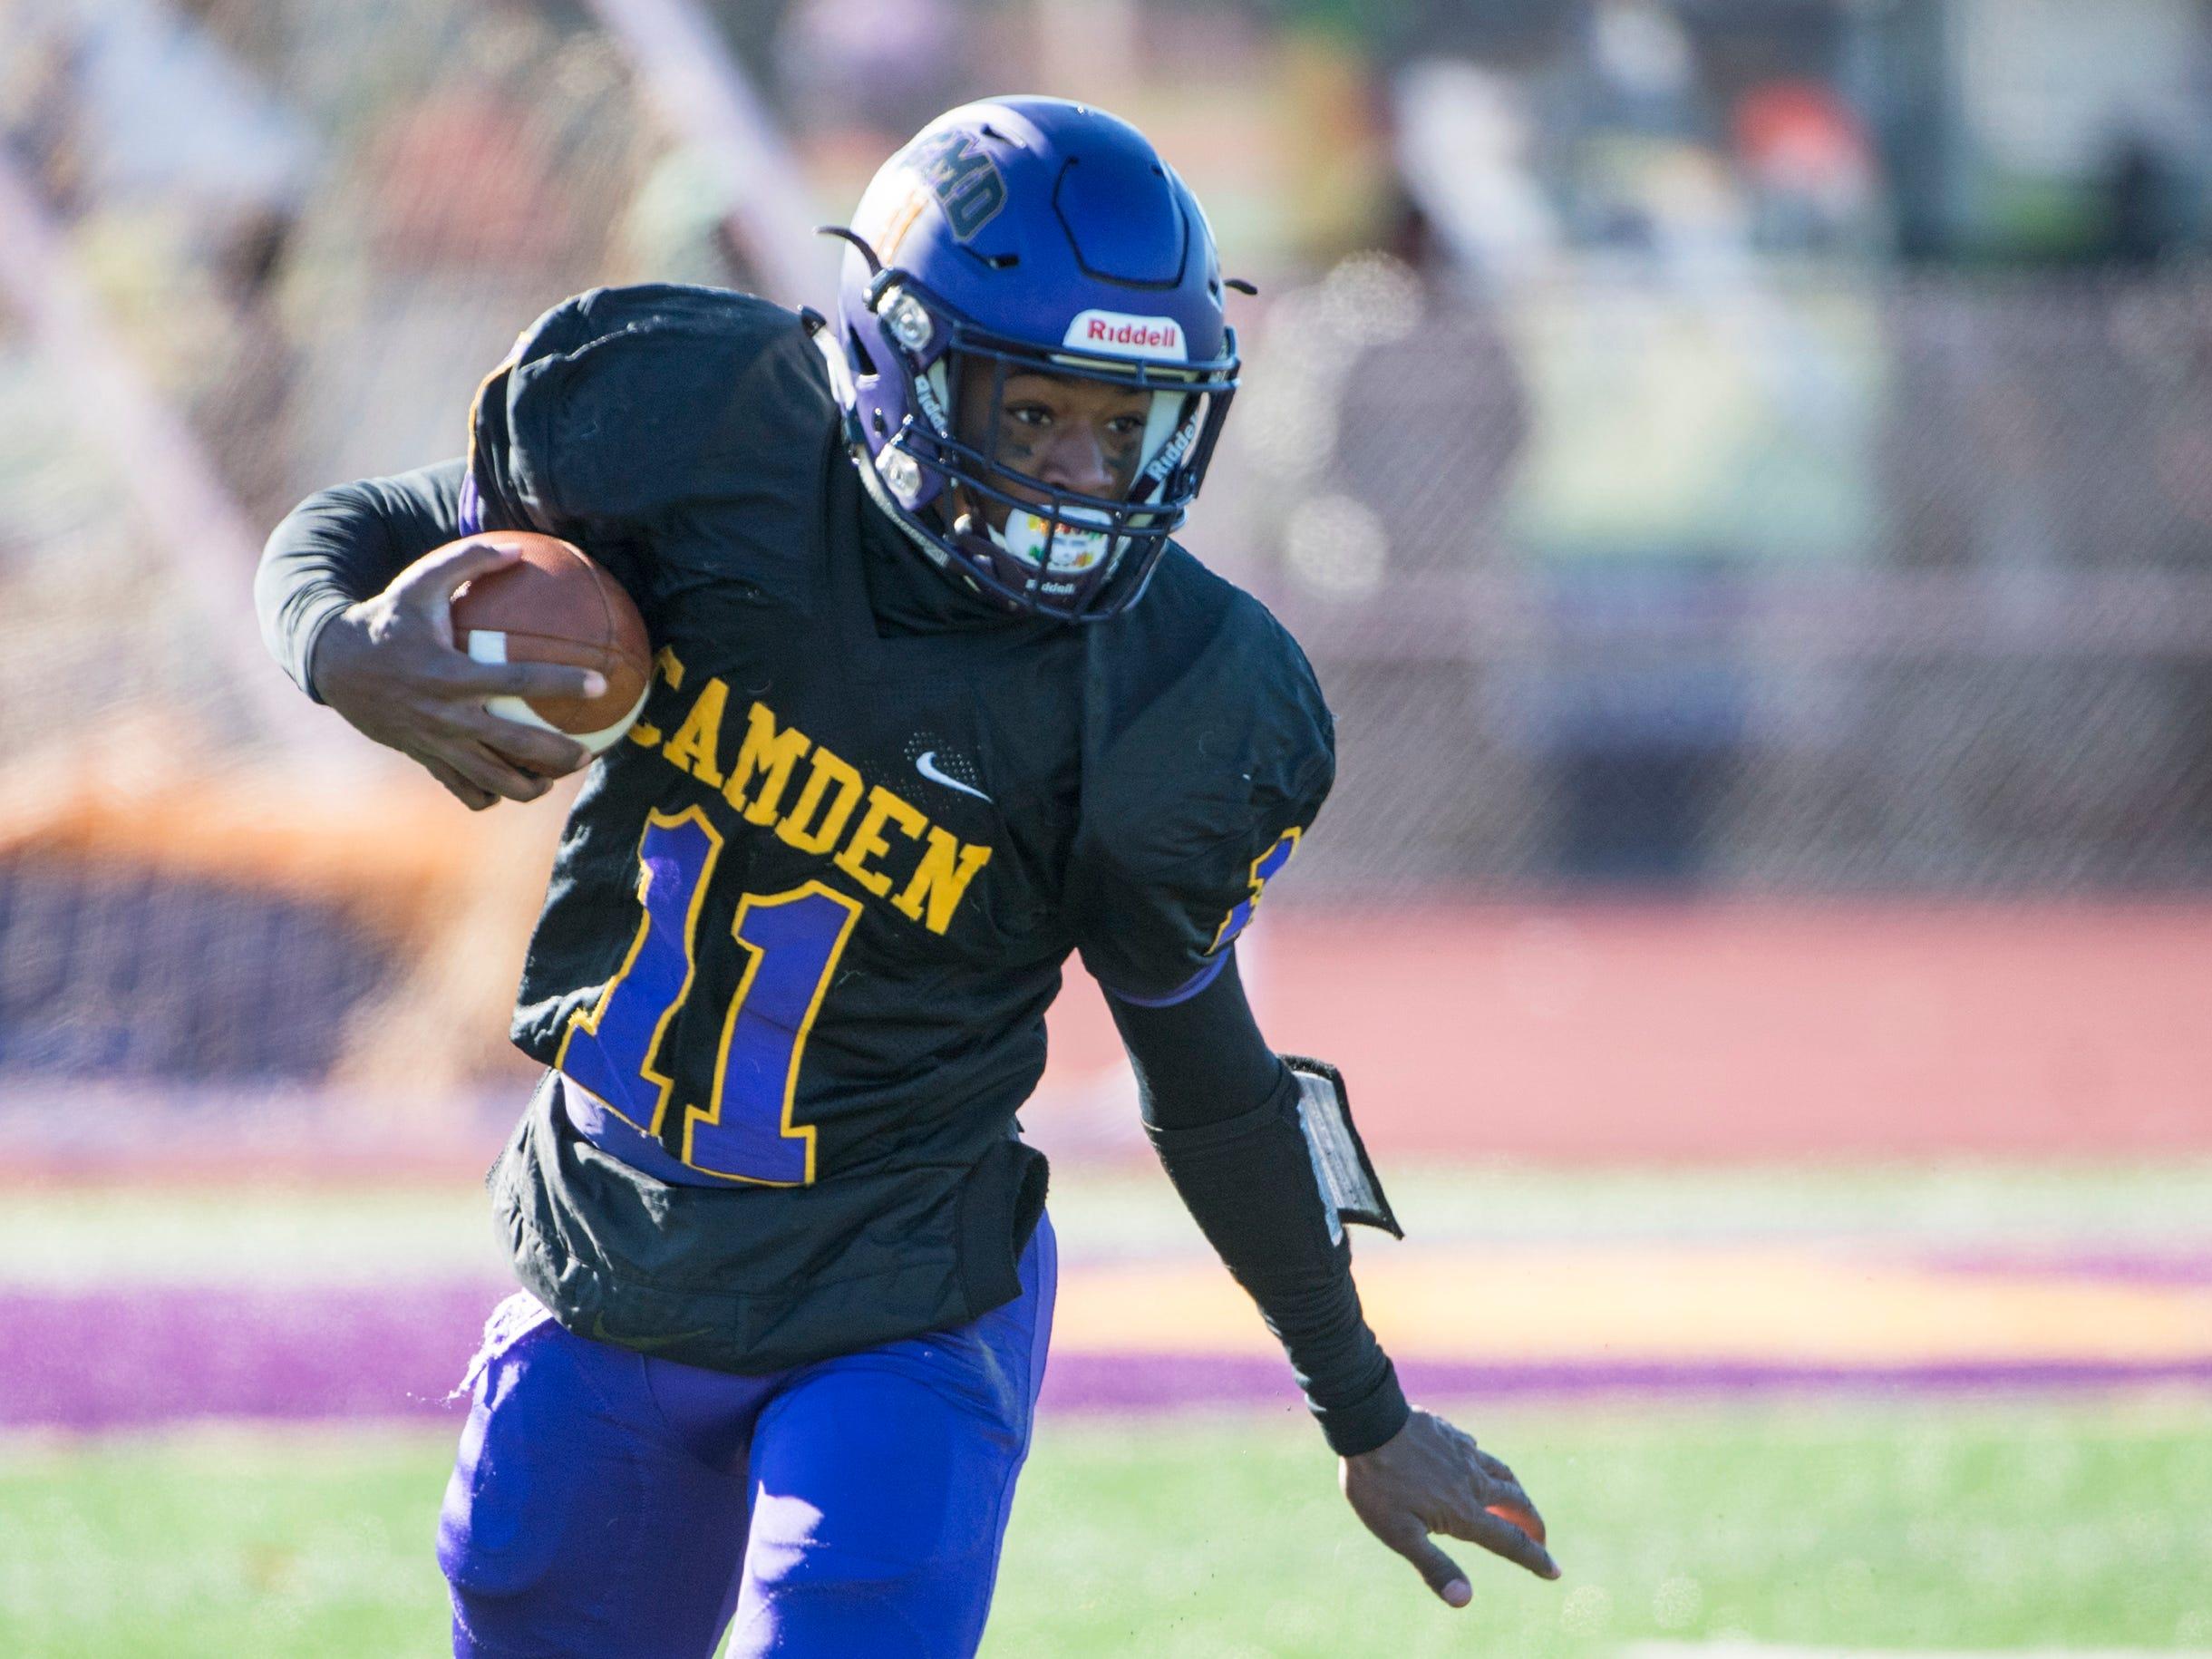 Camden quarterback Monte Williams (11) rushes during an annual Camden-Woodrow Wilson Thanksgiving game Thursday, Nov. 22, 2018 in Camden, N.J. Camden won 39-28.